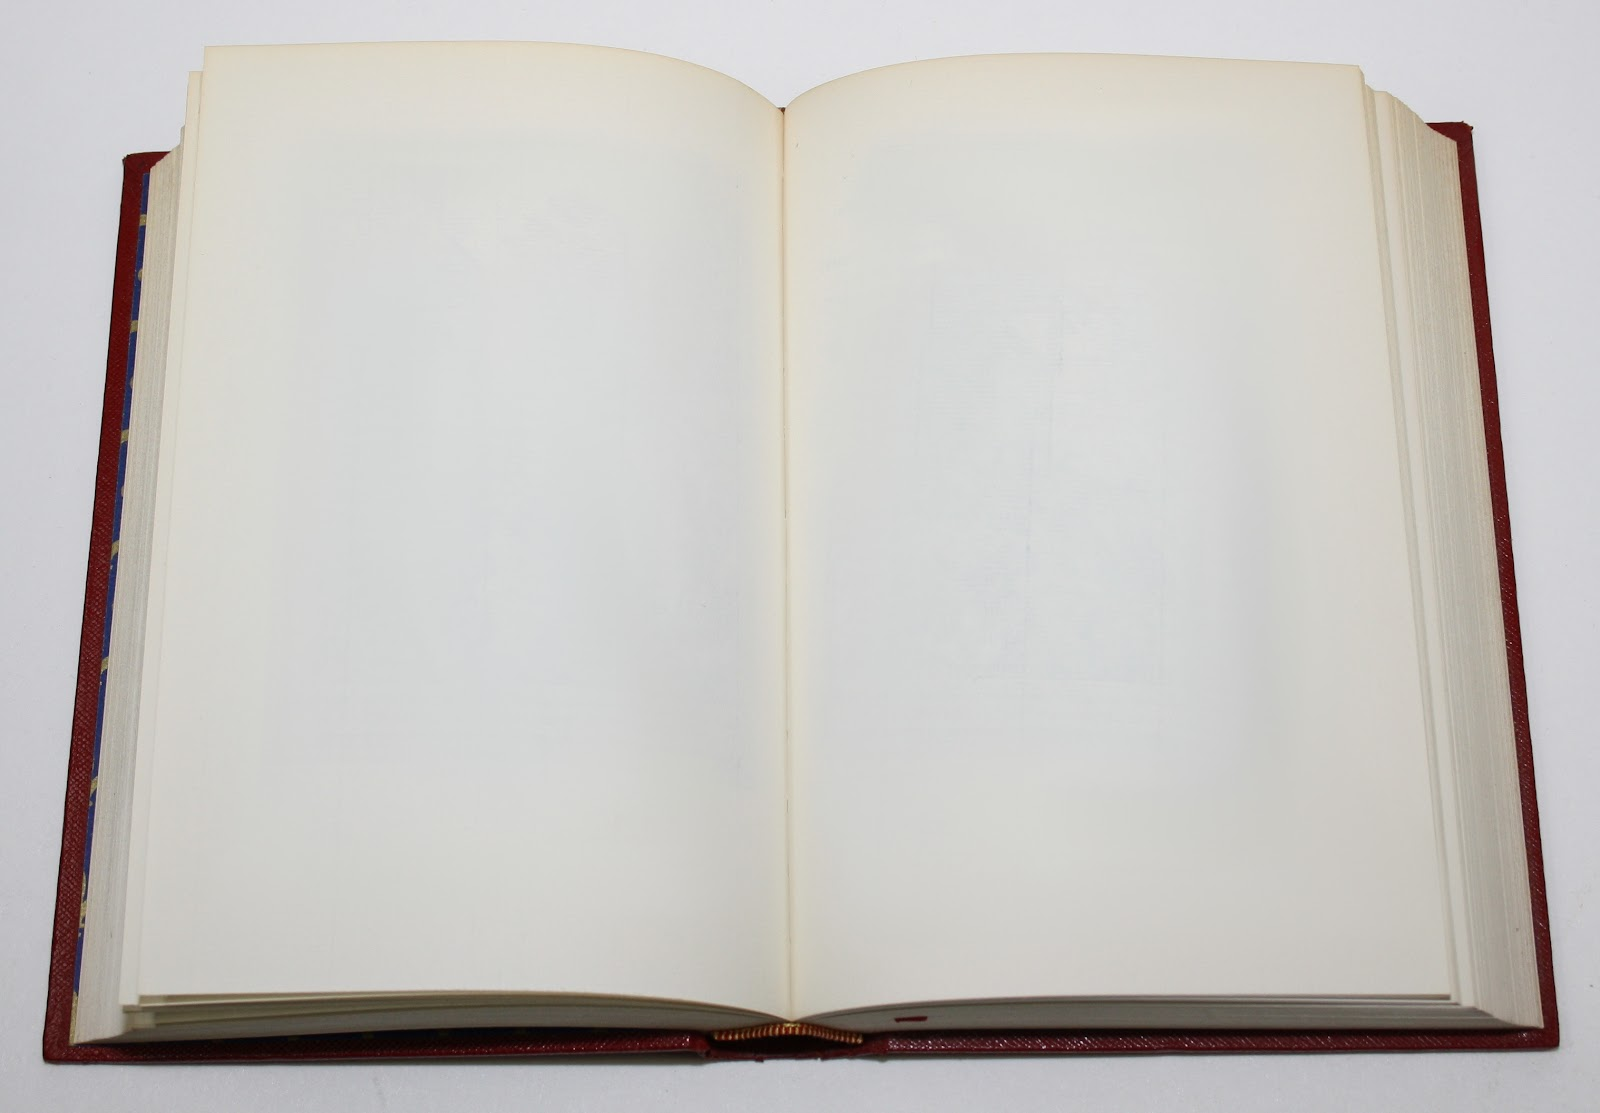 File:Empty book.jpg - Wikimedia Commons